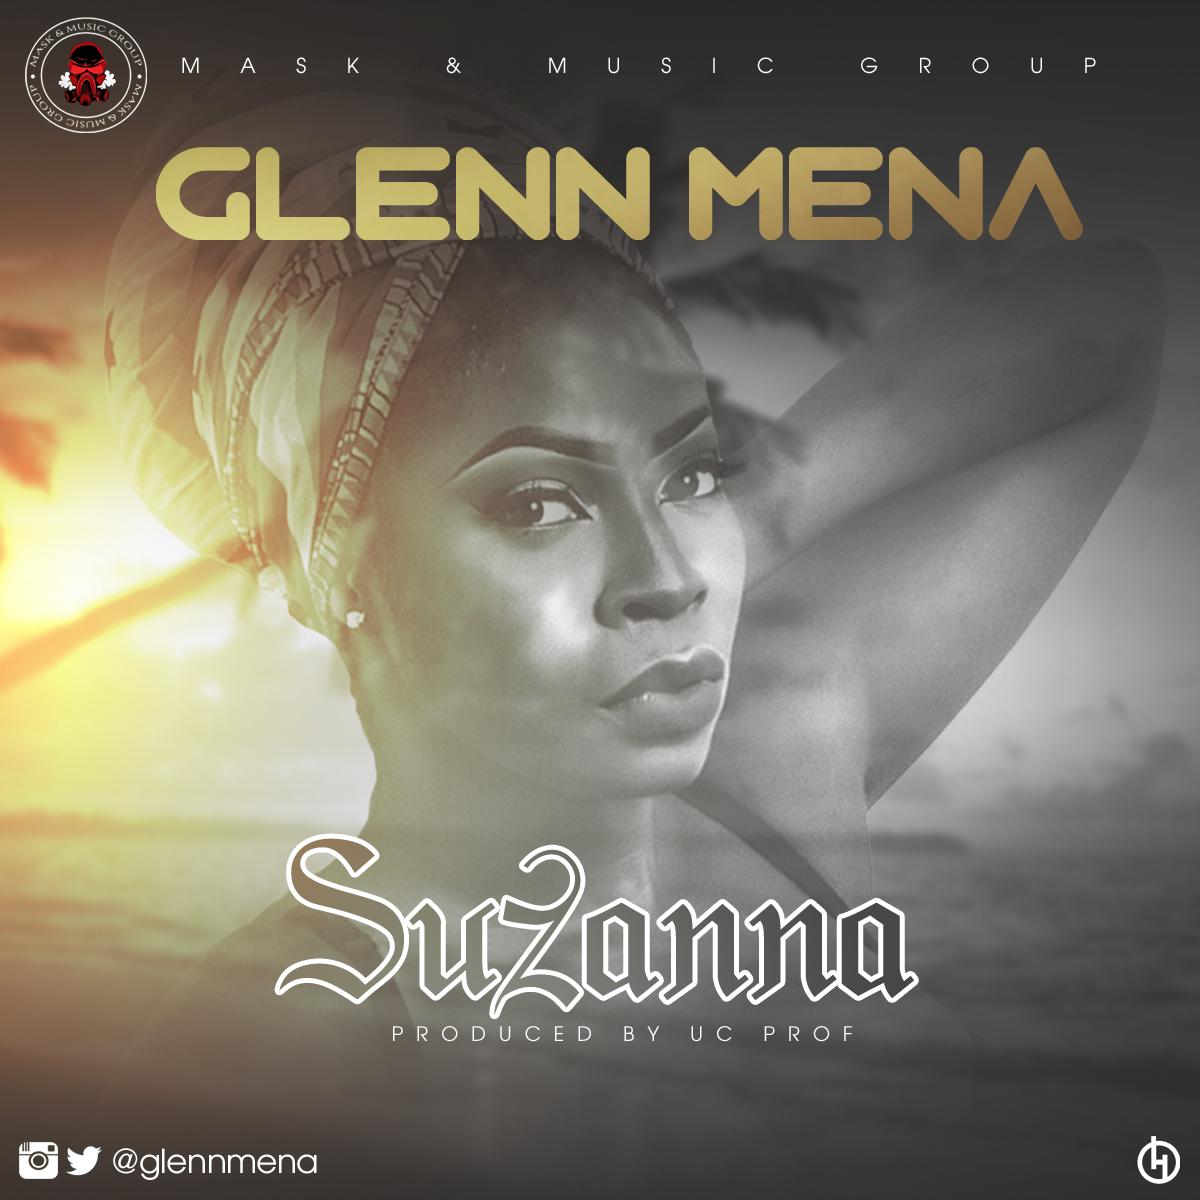 Glenn Mena - Suzanna (Prod. by UC Prof)